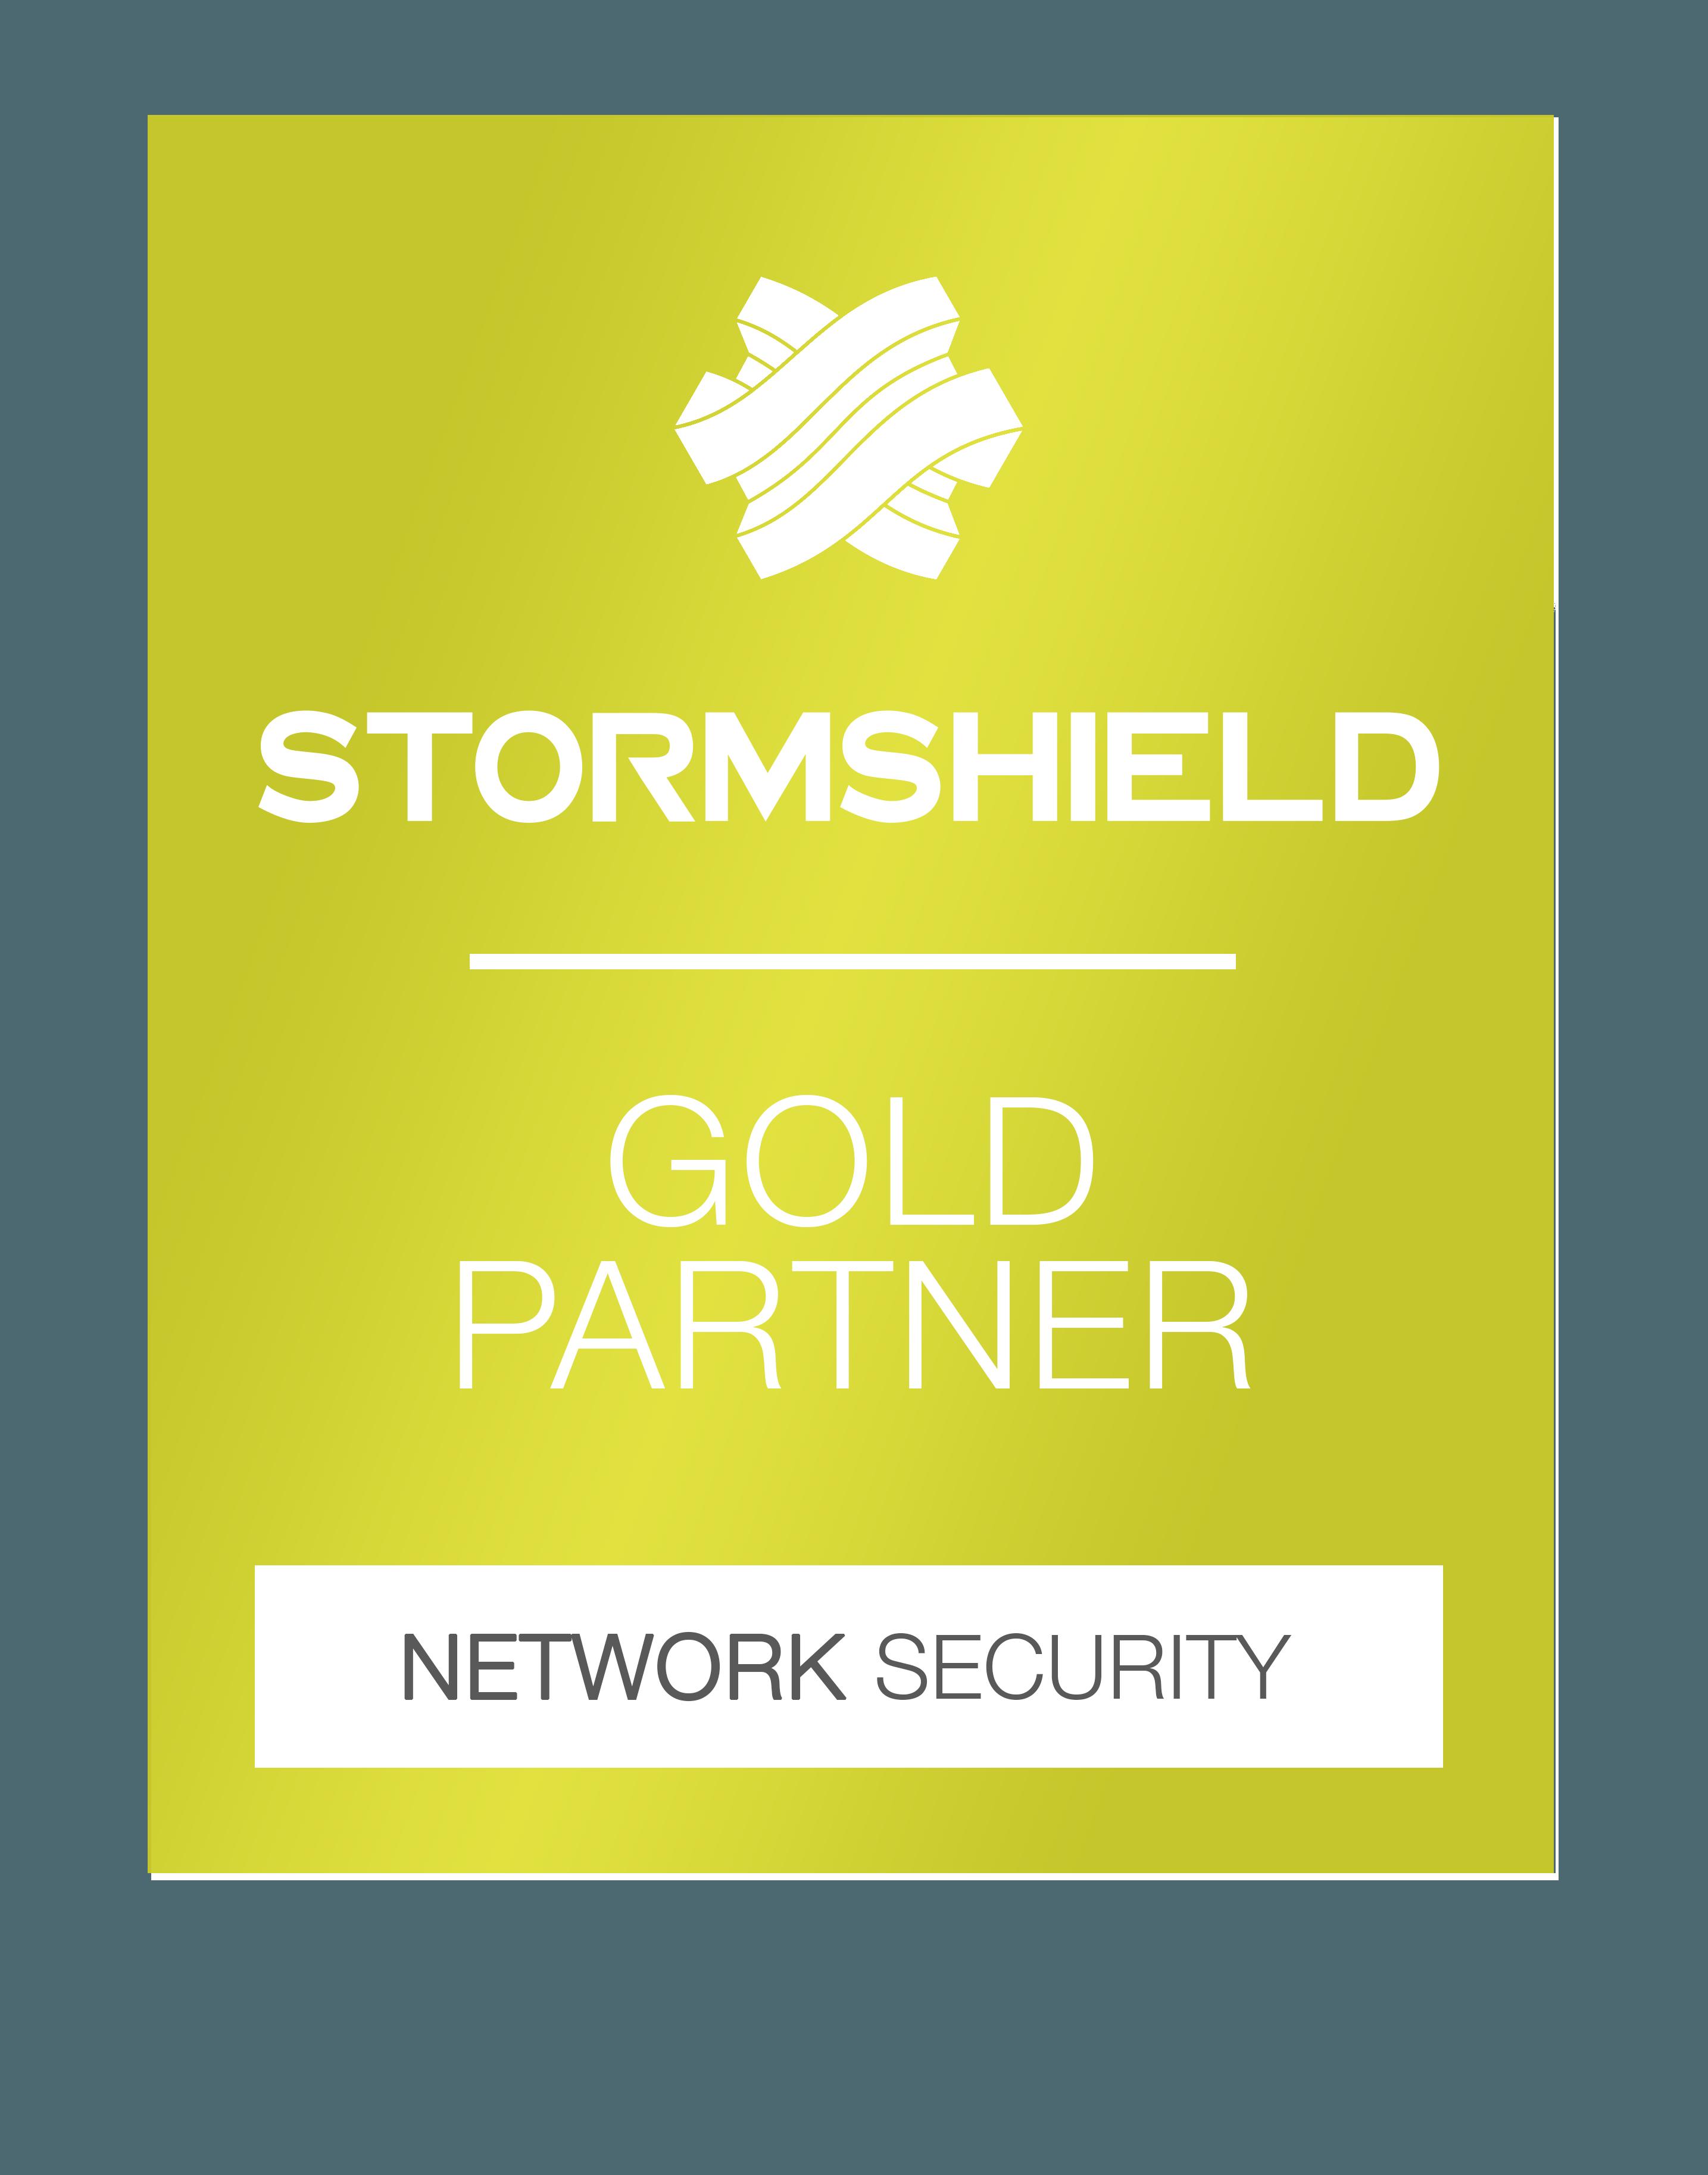 MSI Stormshield Gold Partner